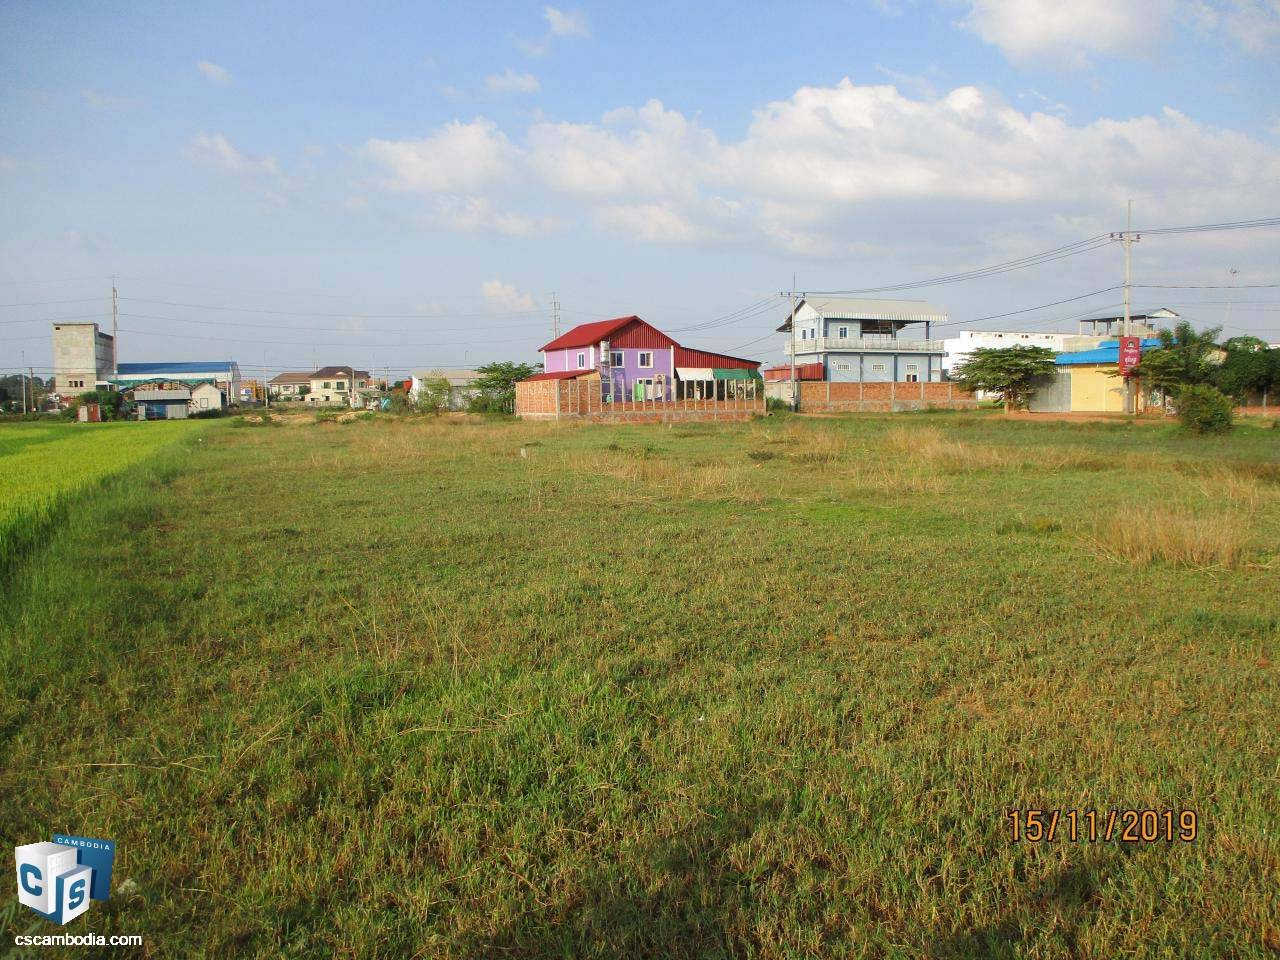 1,632 Sq Meters Of Land – For Sale – Chreav Commune– Siem Reap